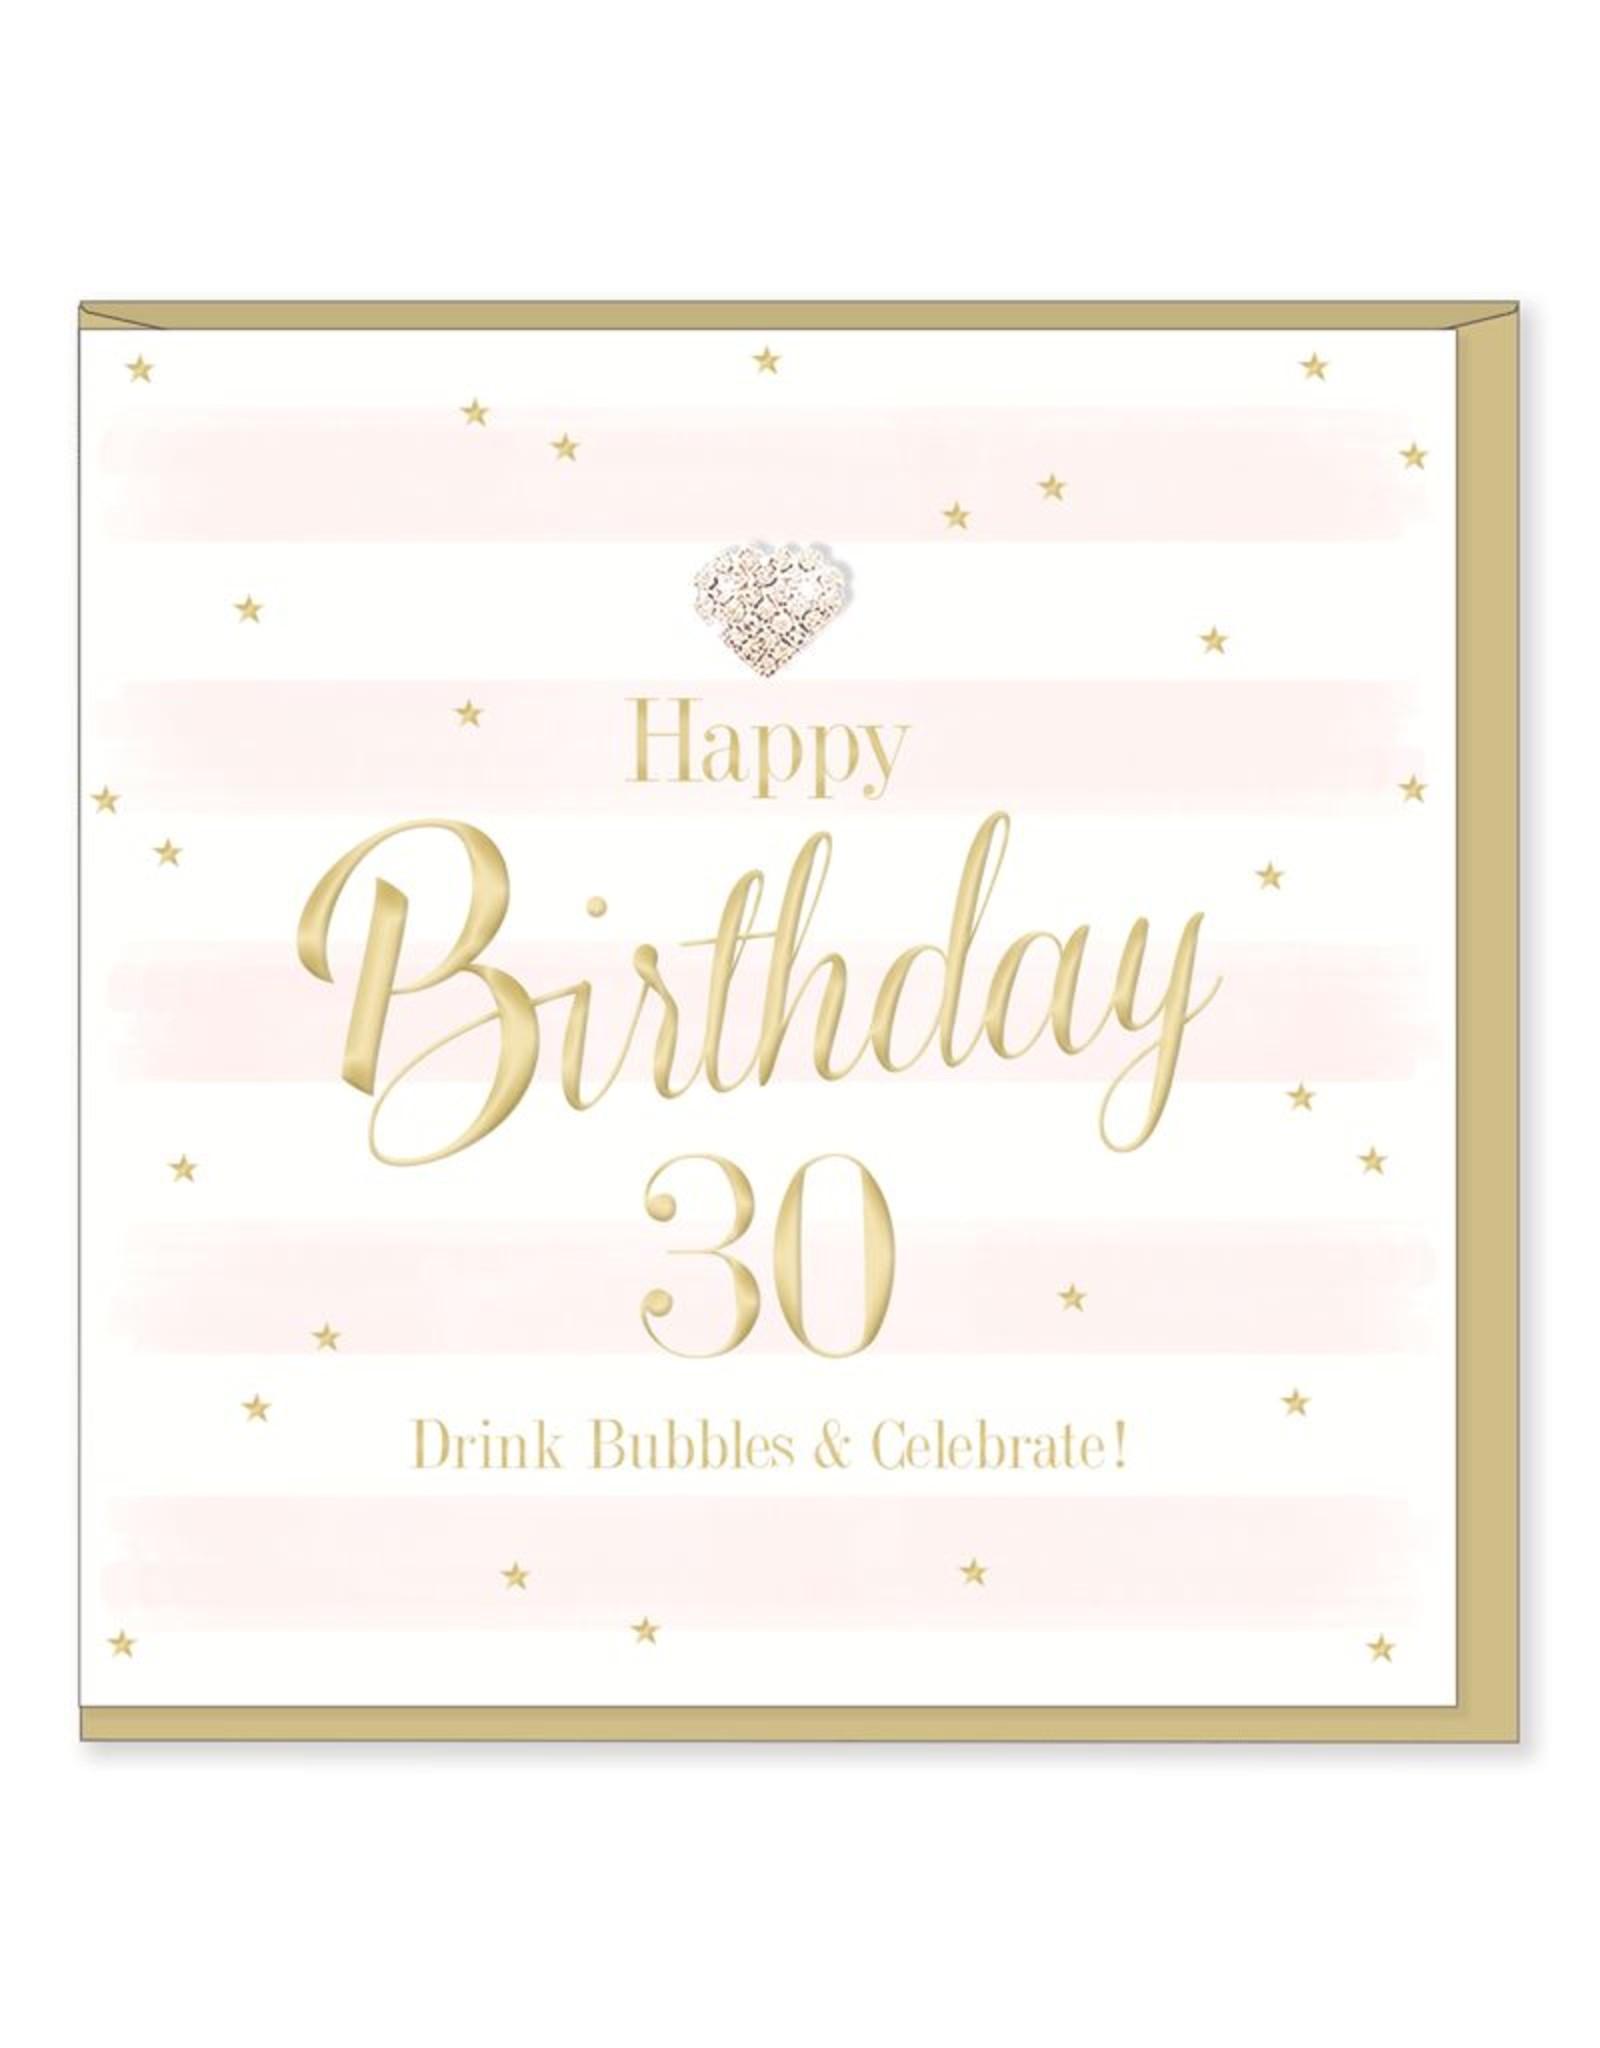 Hearts Design Wenskaart - Birthday 30